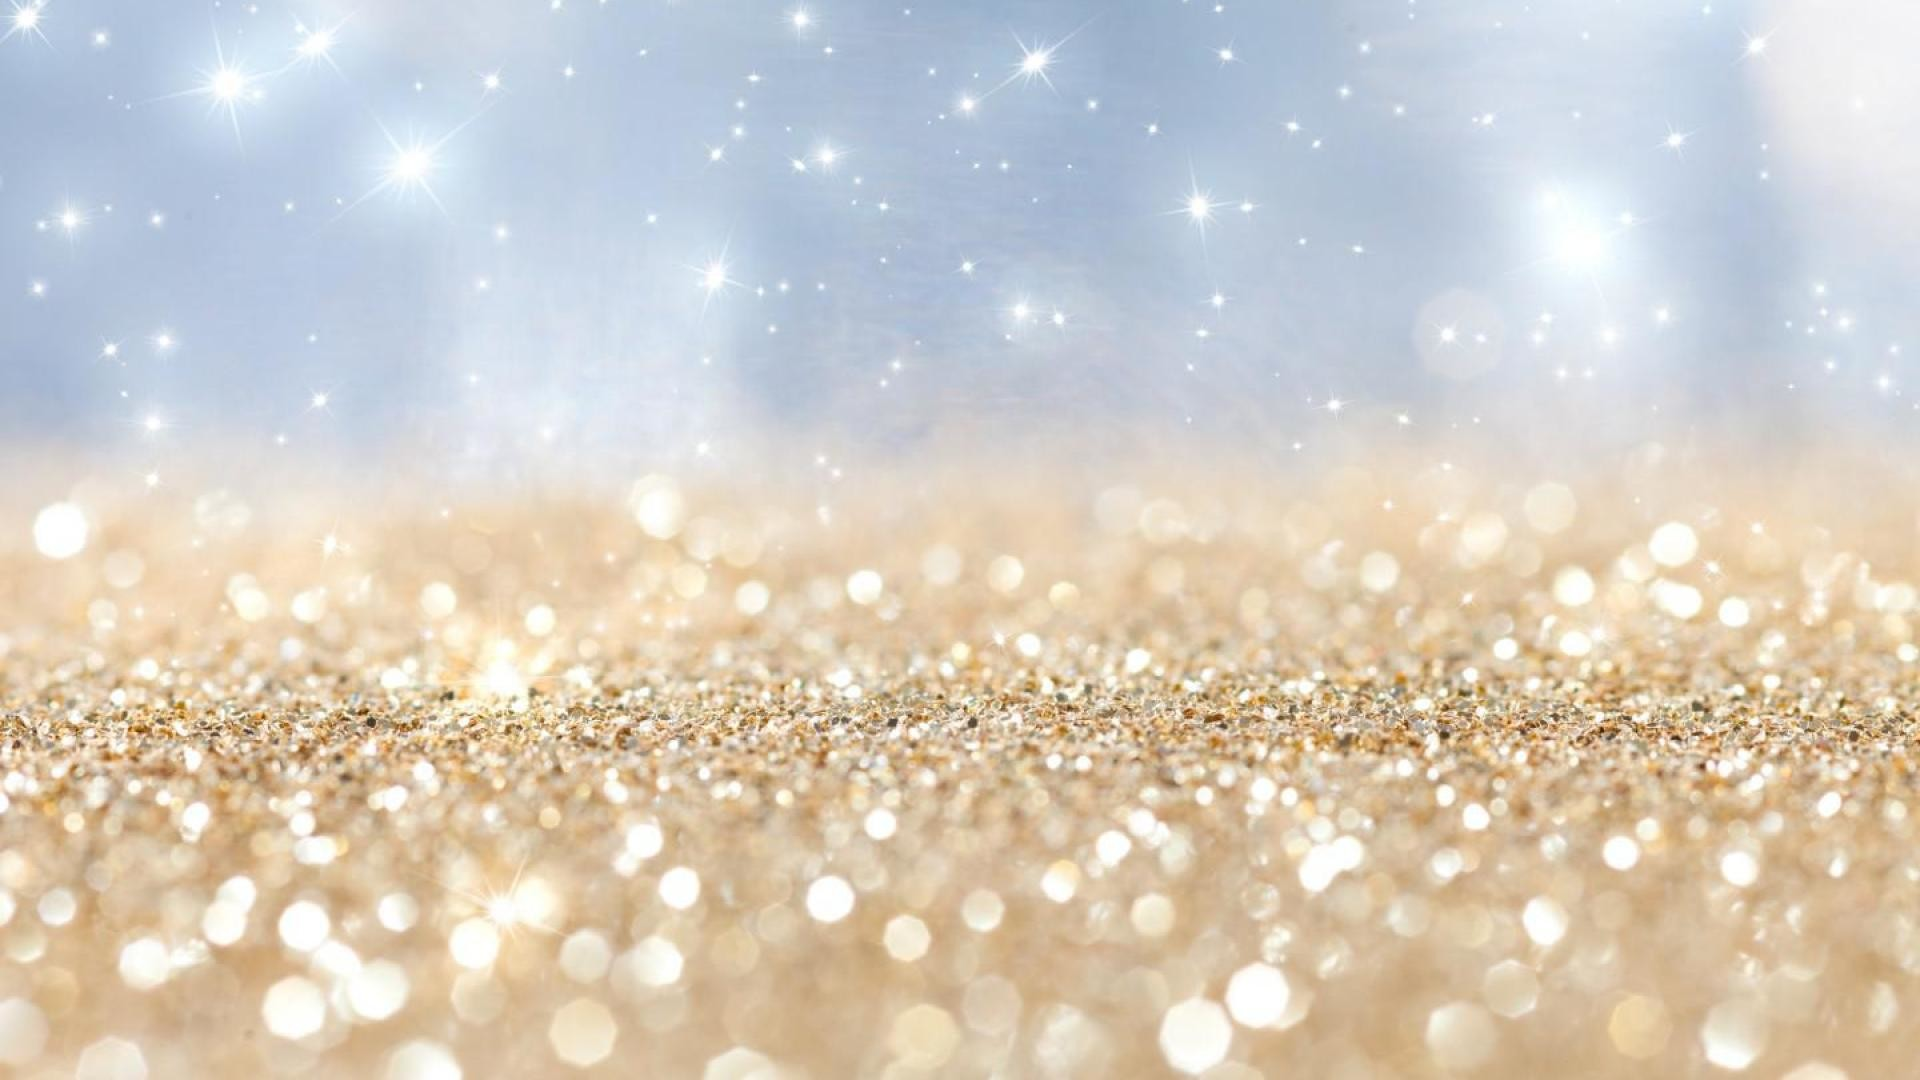 … Glitter HD Wallpaper 3